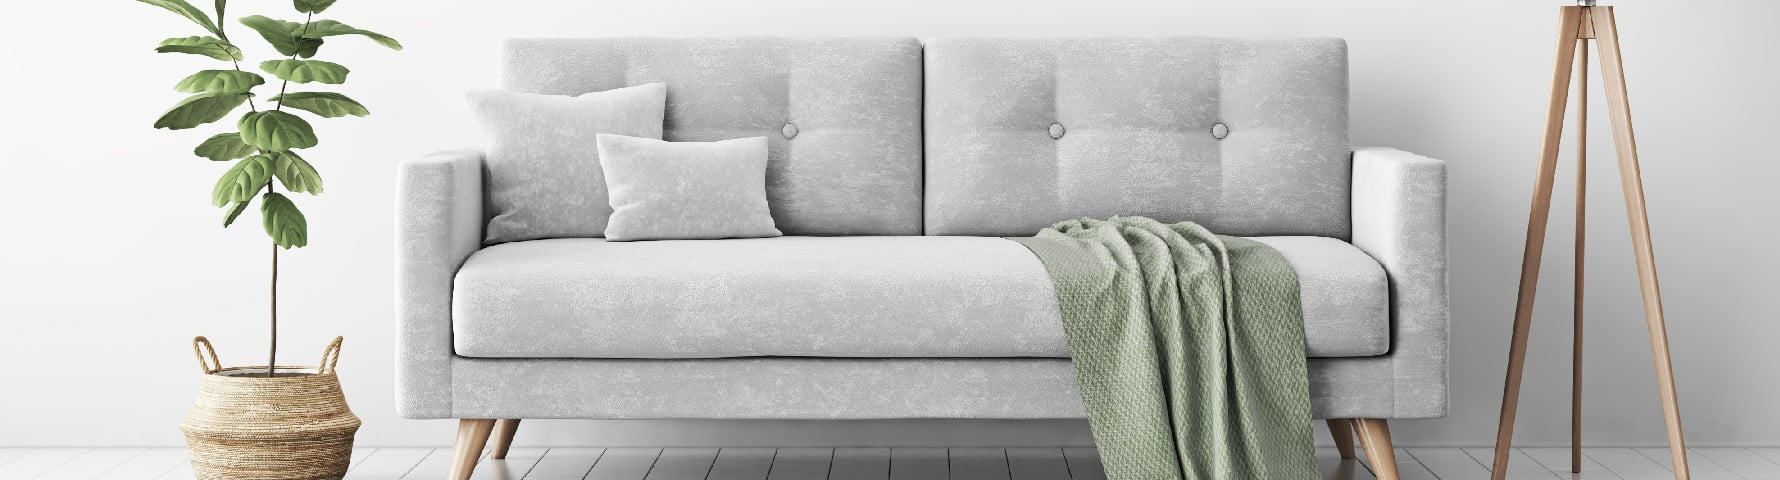 Sofa and plant